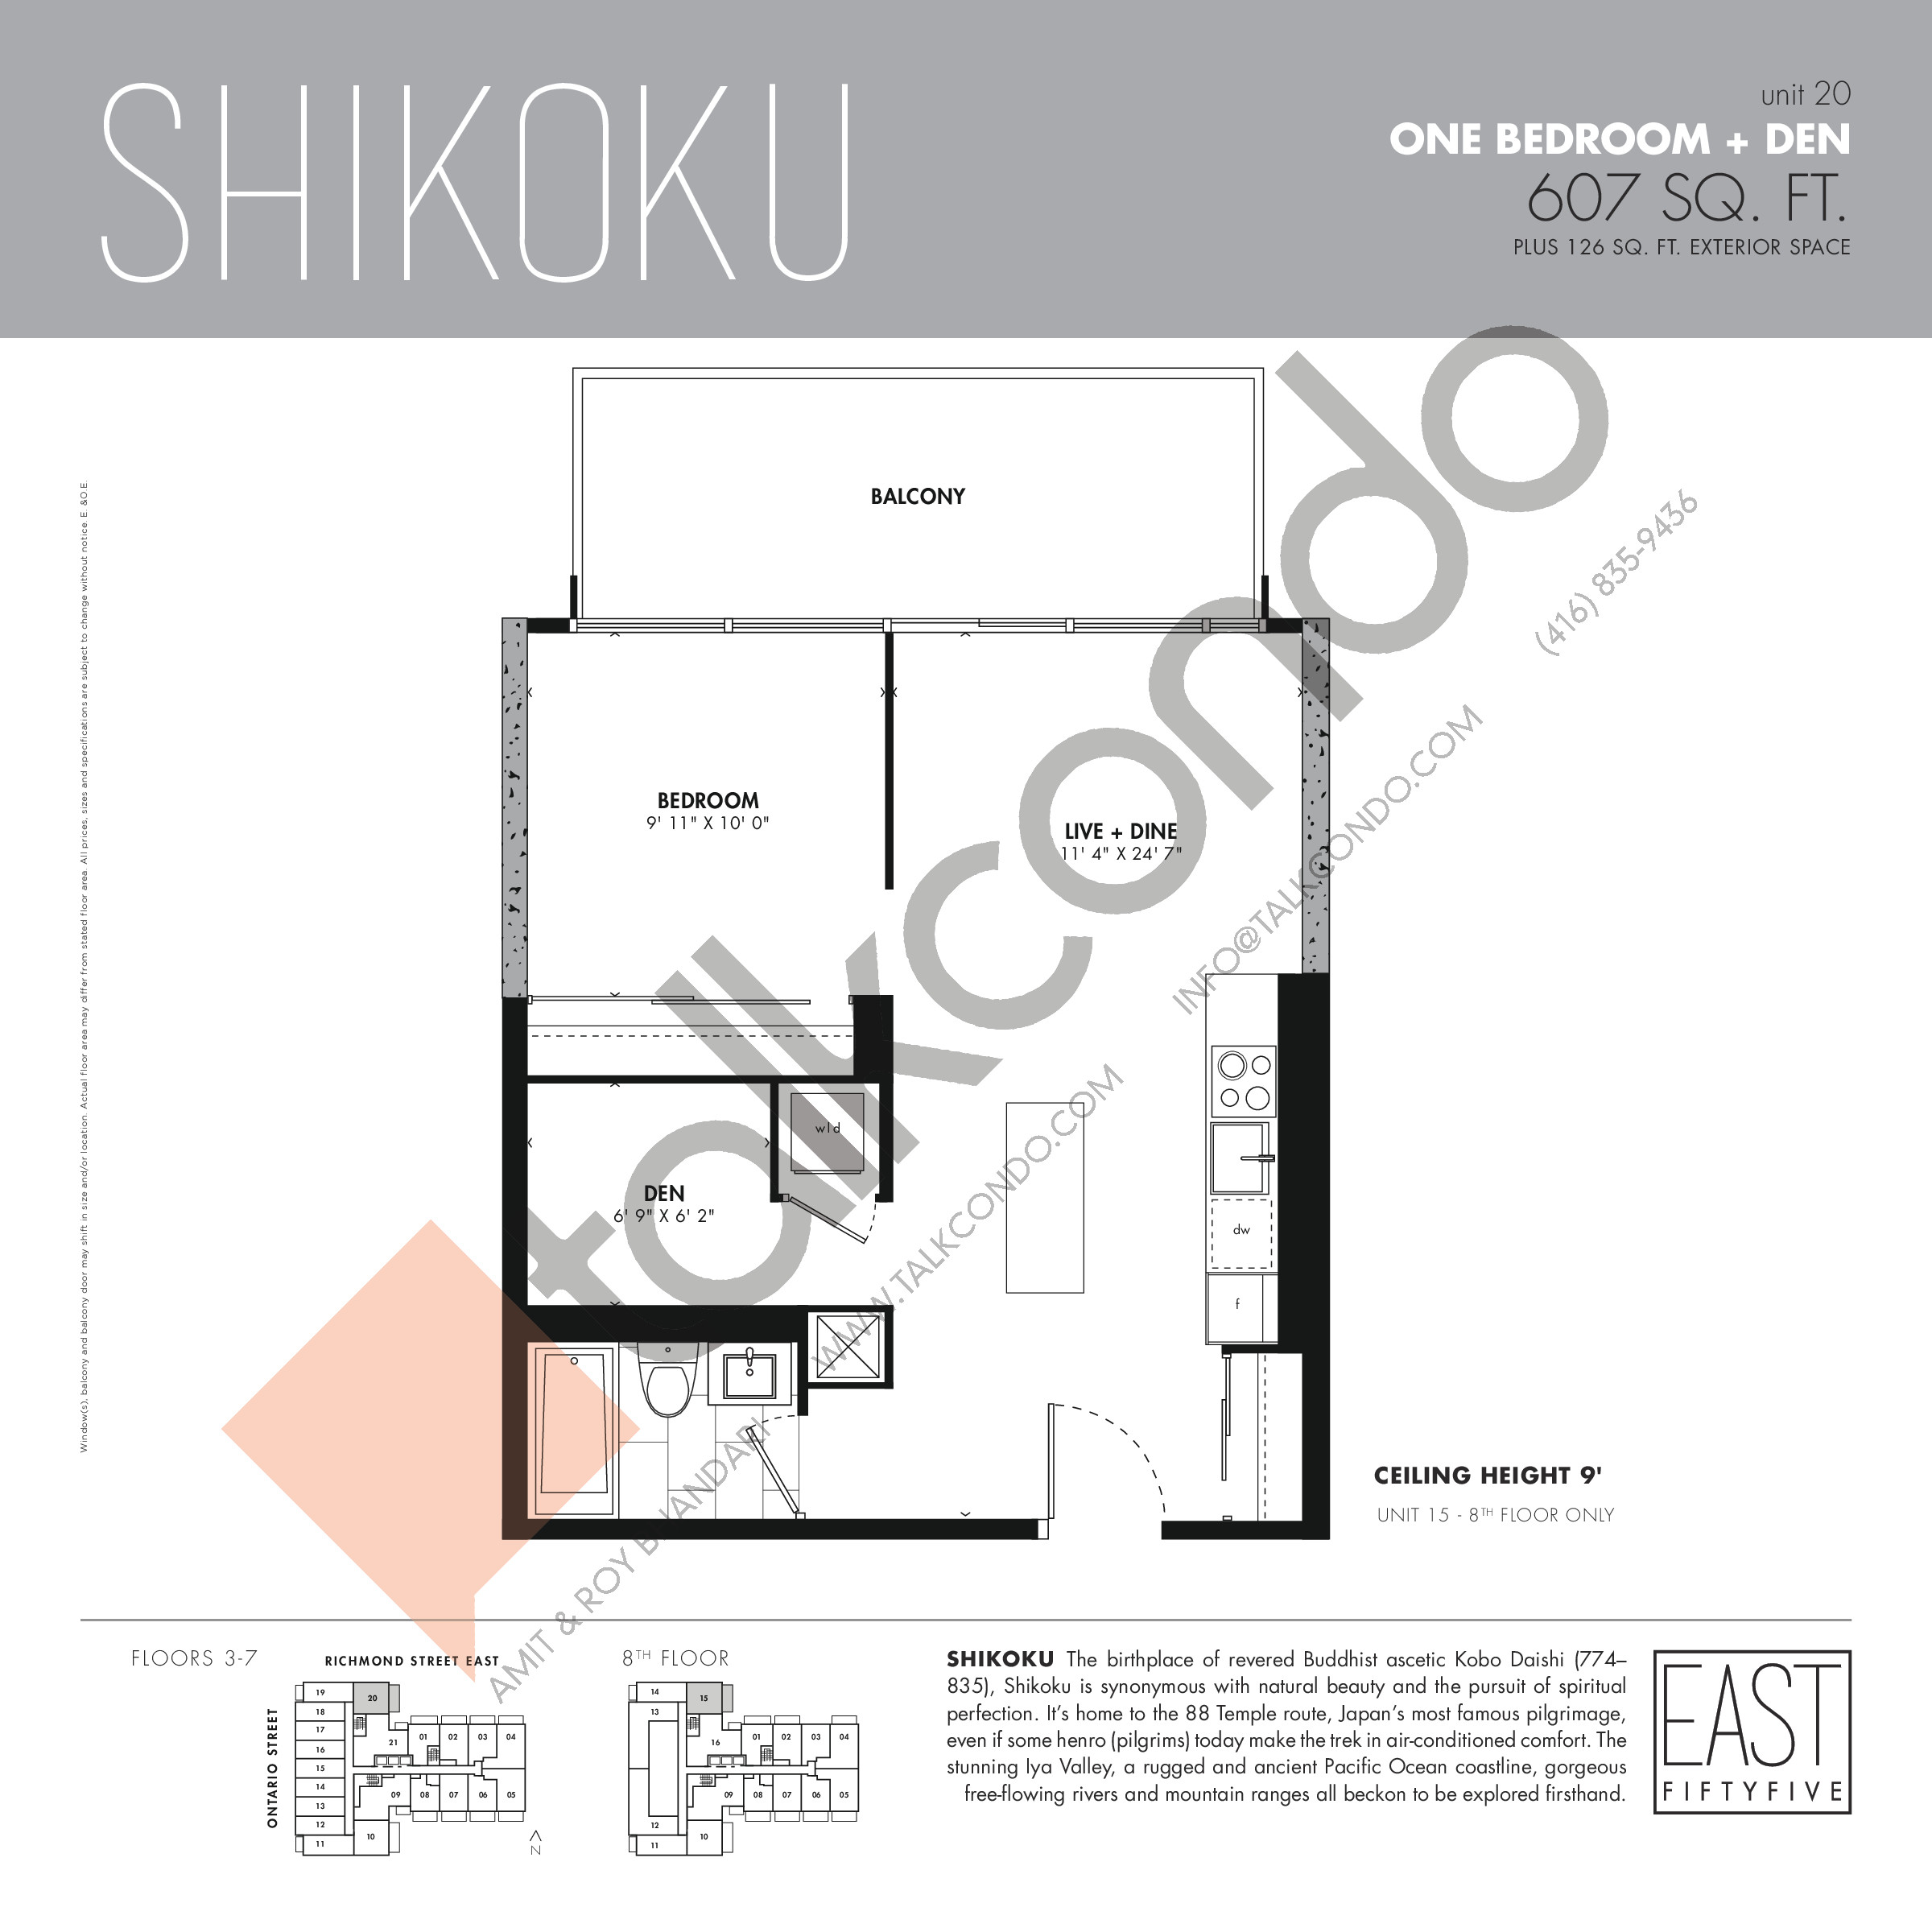 East 55 Condos Shikoku 607 Sq Ft 1 5 Bedrooms